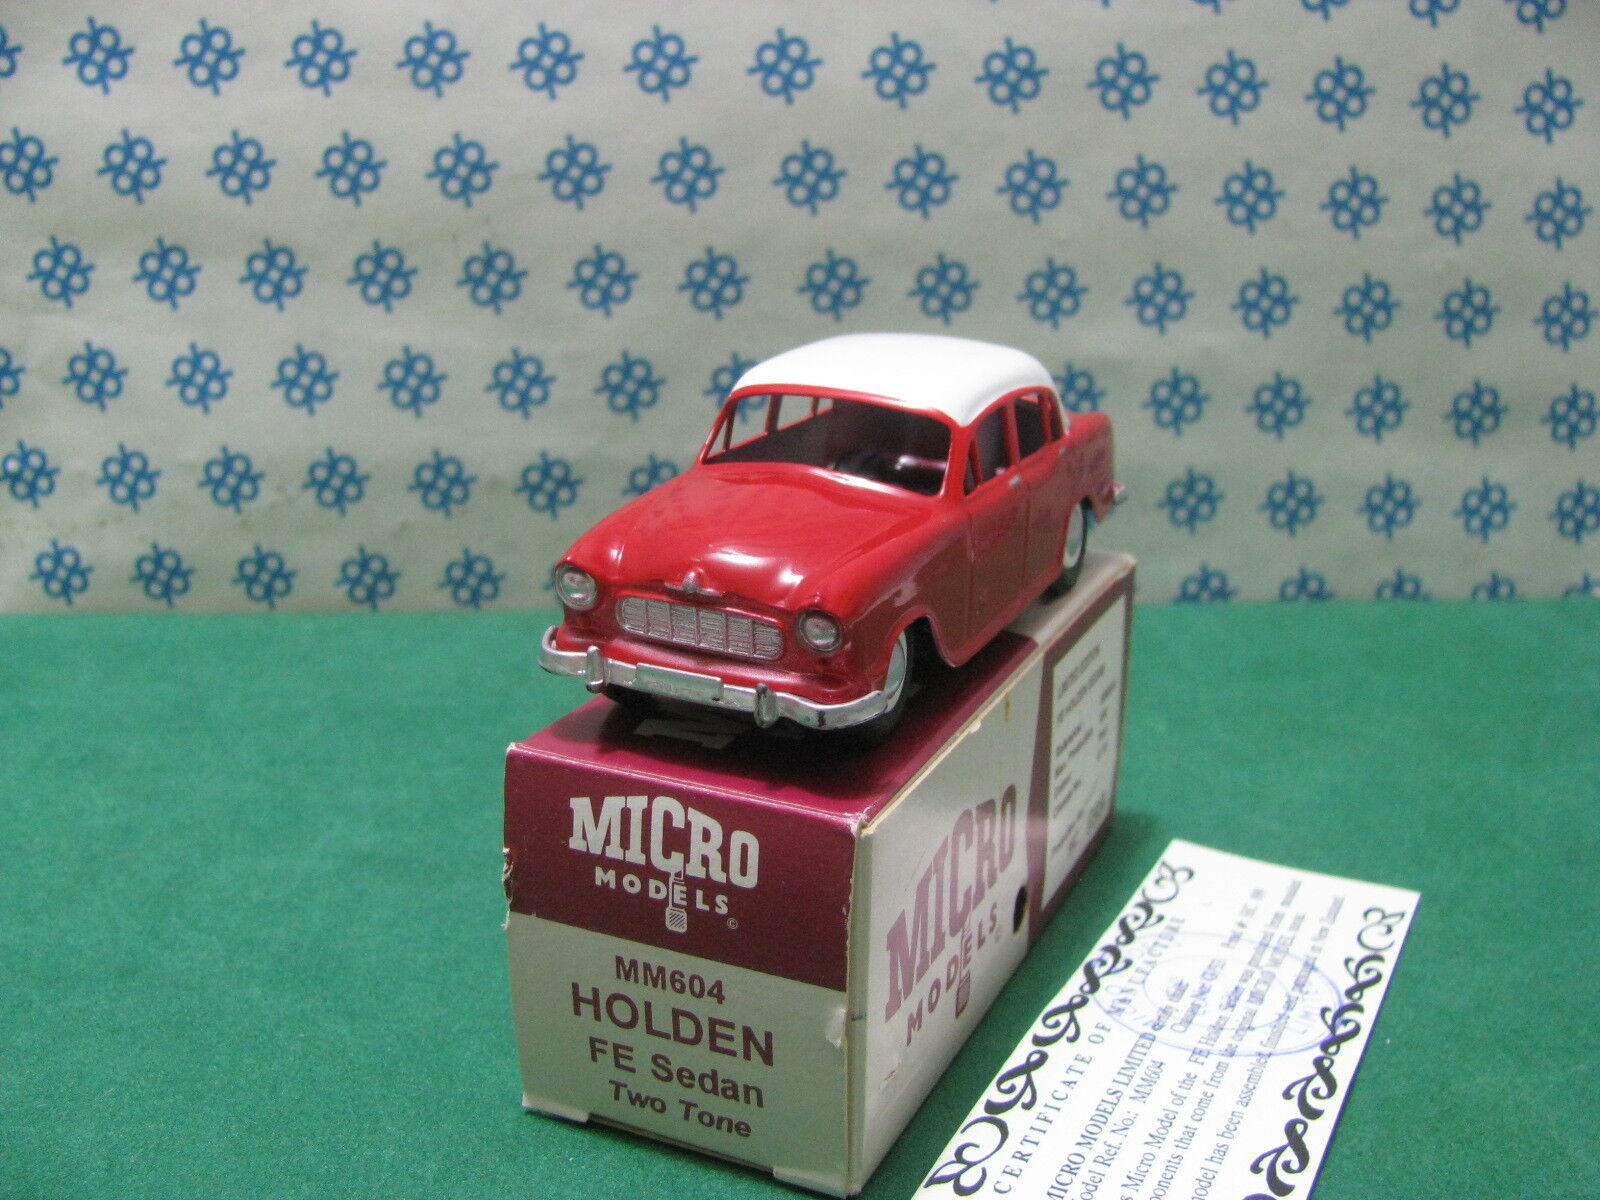 Vintage  Micro Models -  HOLDEN  FE  berlina biColor   MM604   -   MIB